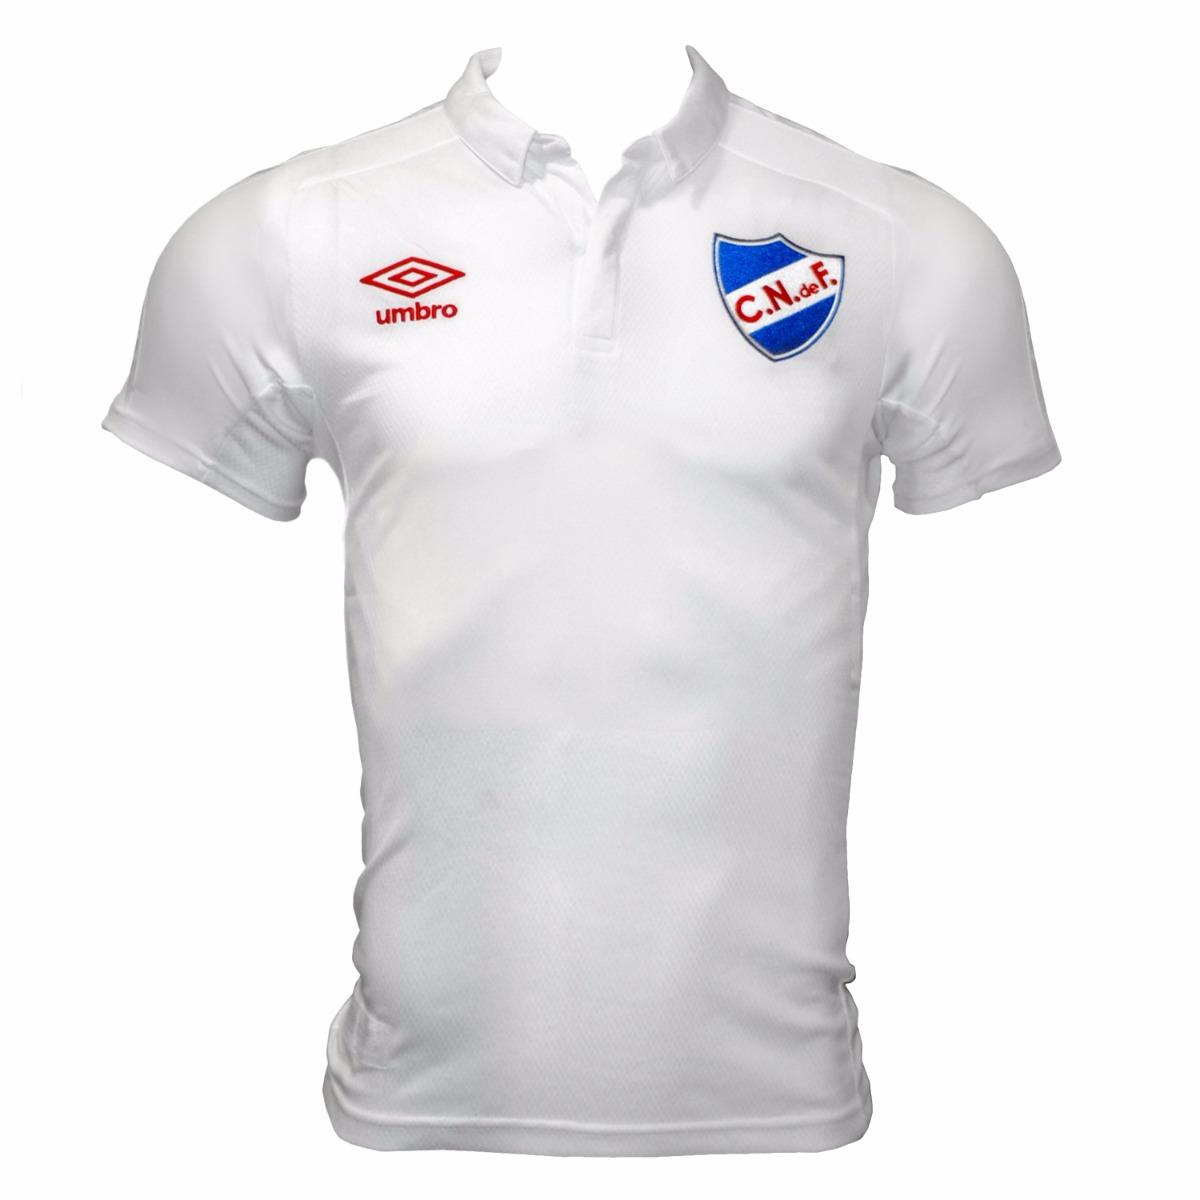 camiseta blanca 2017 niño club nacional de football umbro. Cargando zoom. 01dfb44f5a1a2